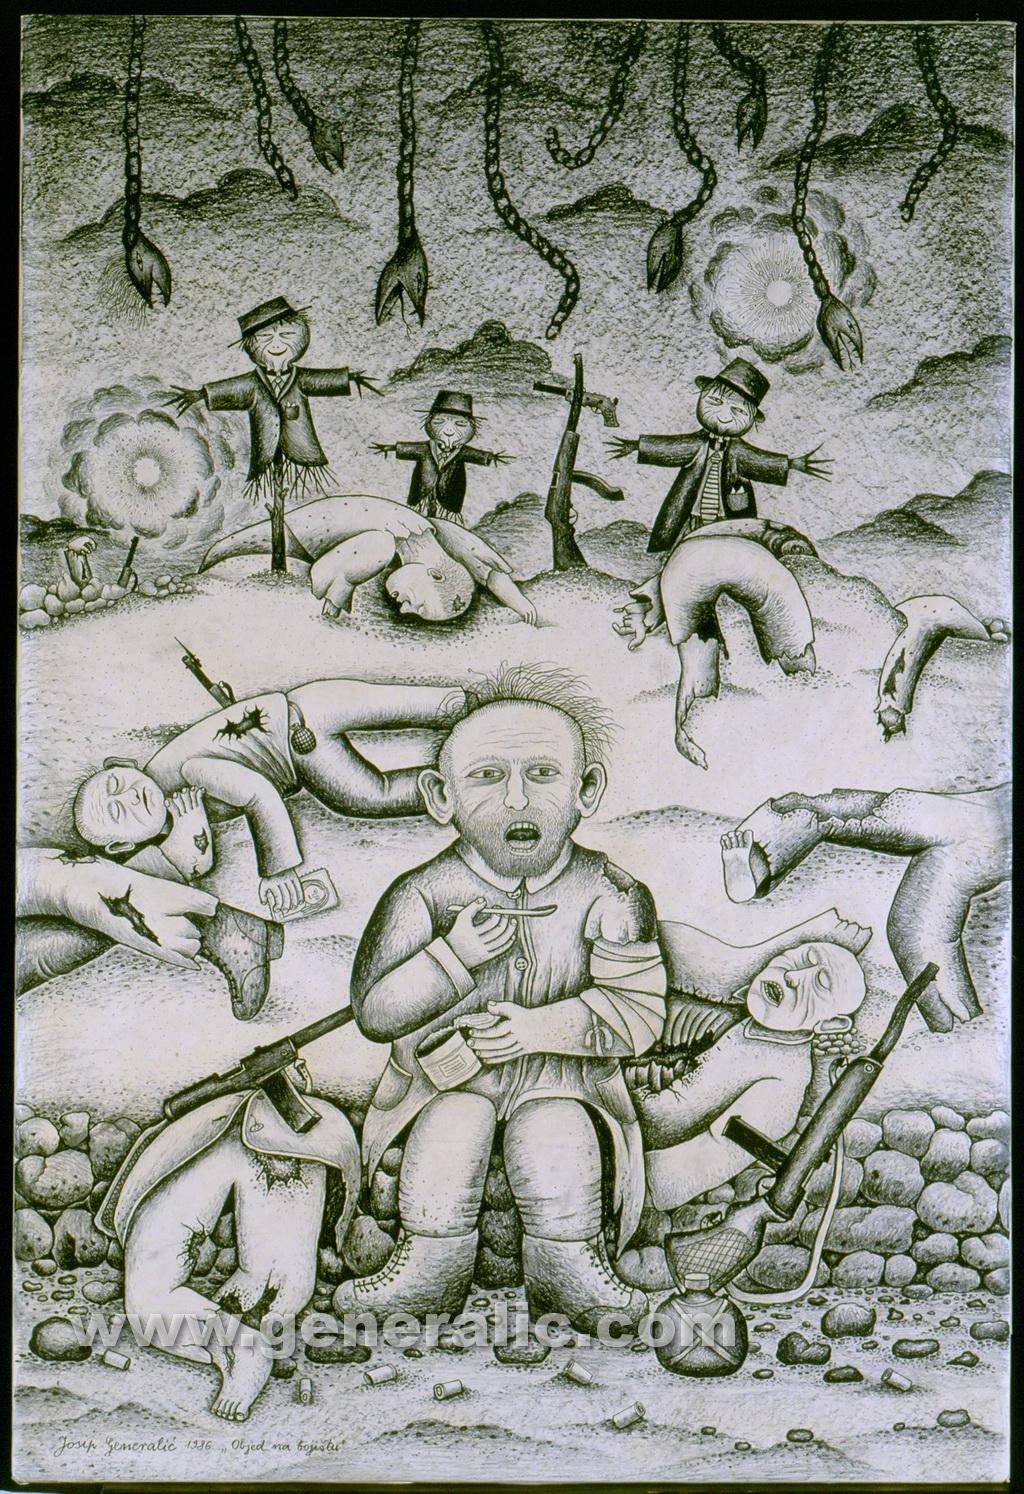 Josip Generalic, 1986, Meal on the field, drawing